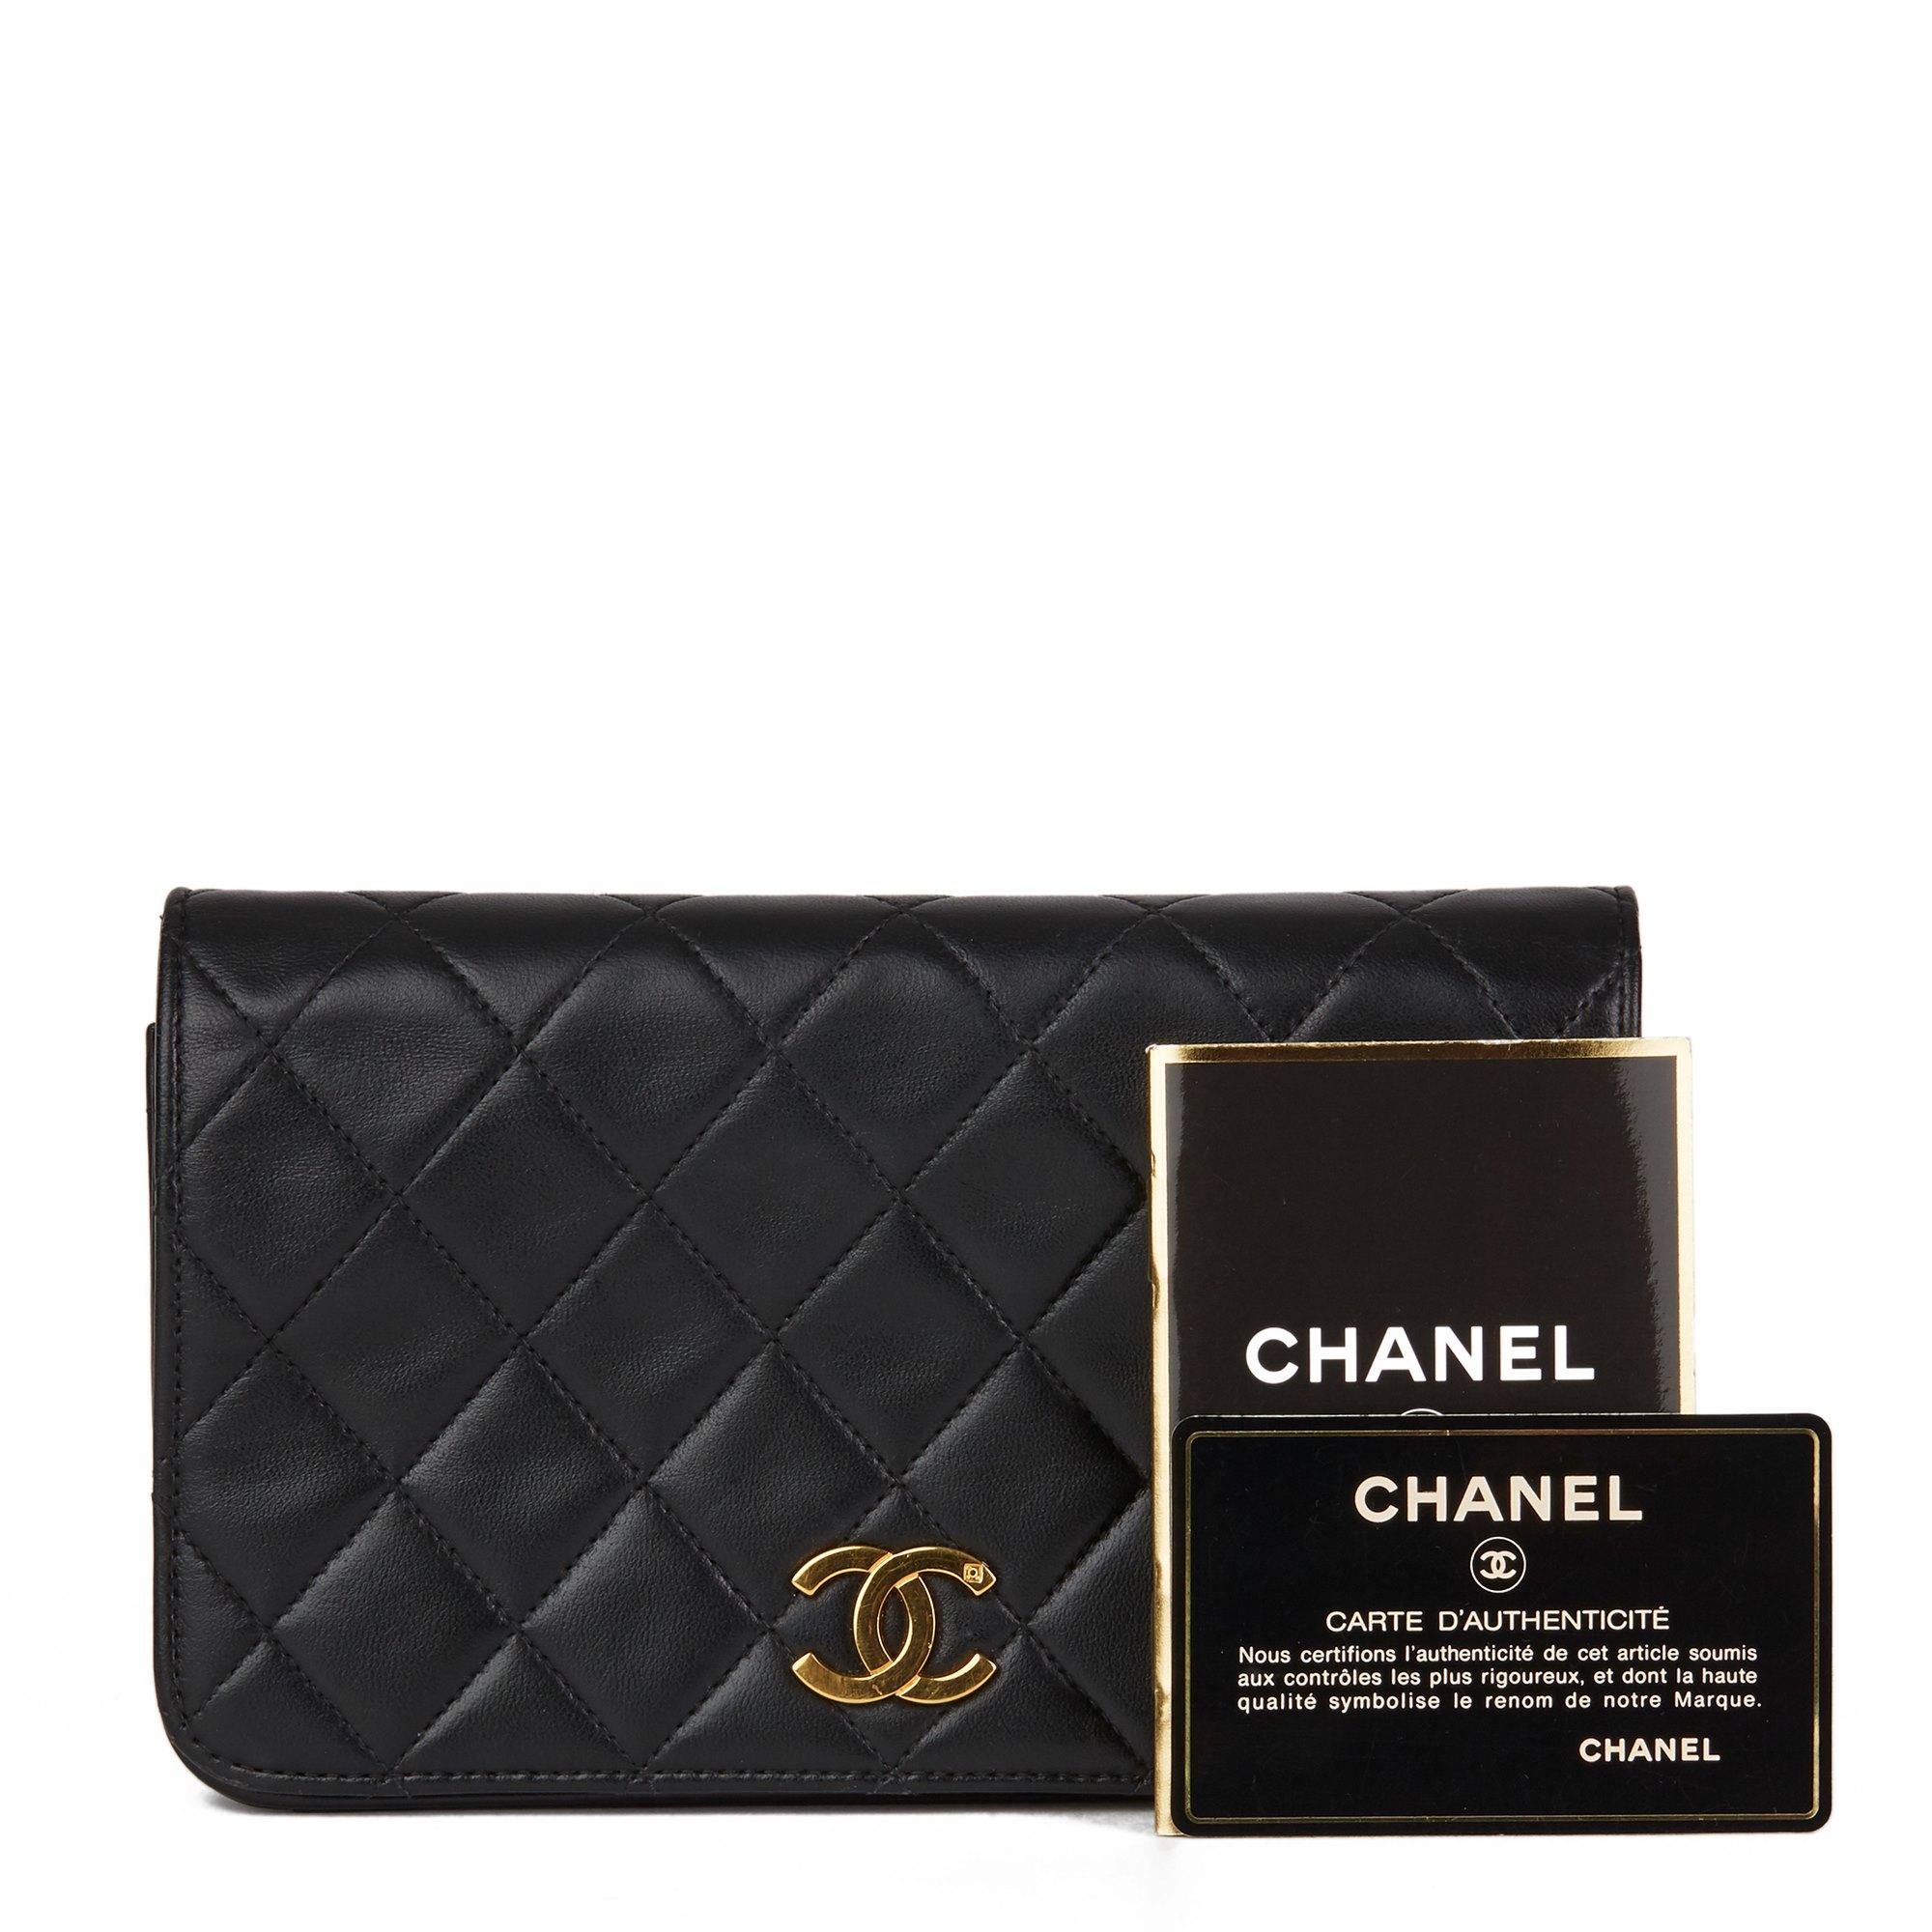 Chanel Black Lambskin Vintage Mini Flap Bag